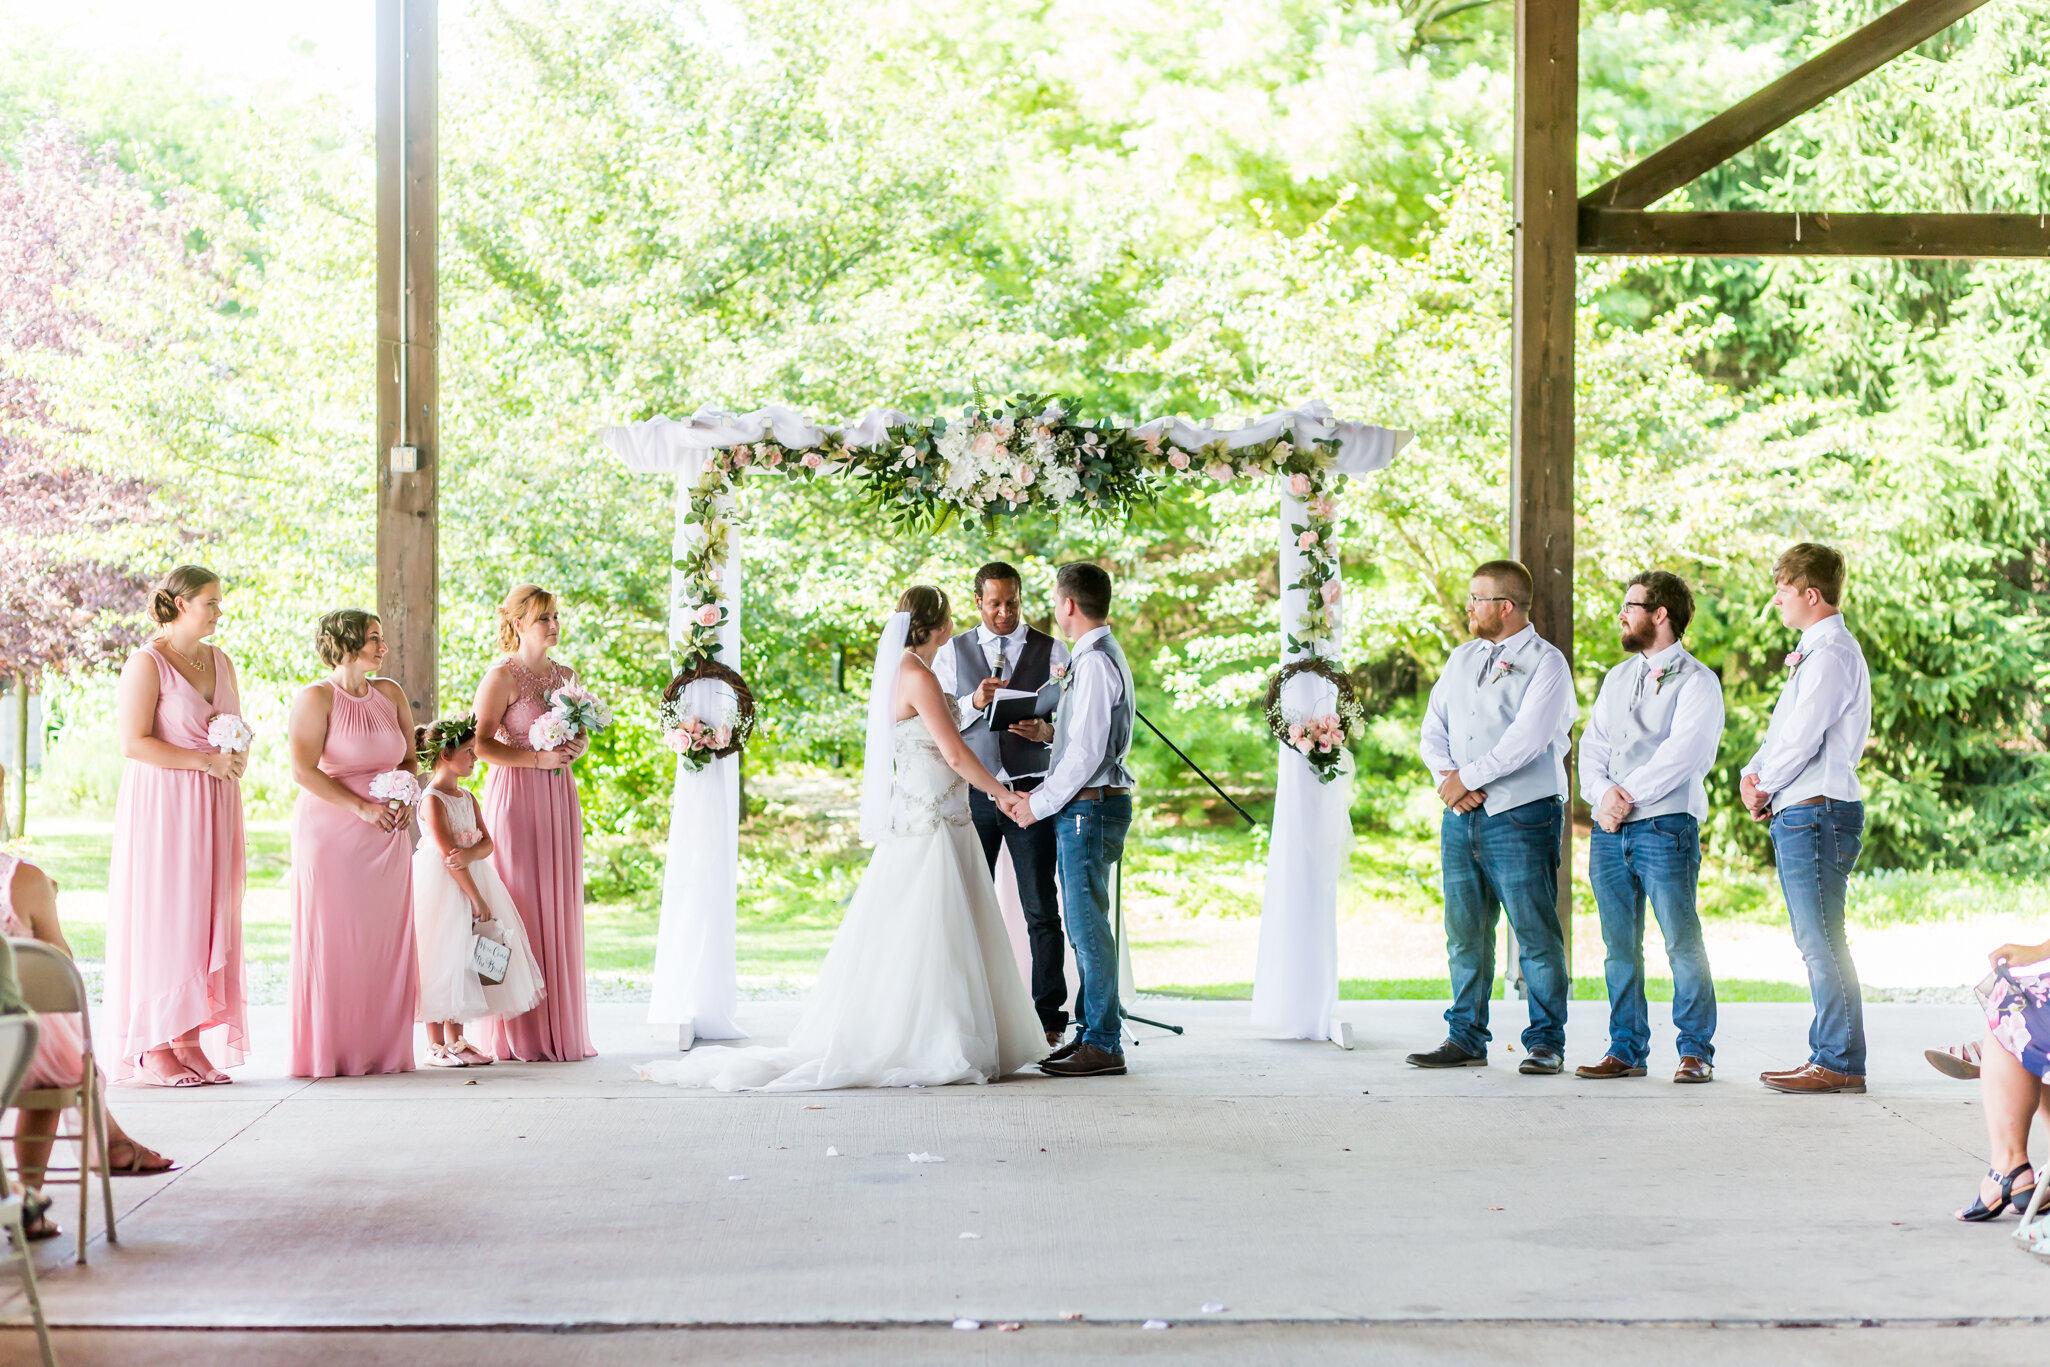 New Castle Arts Park Wedding Photography - S8298.JPG